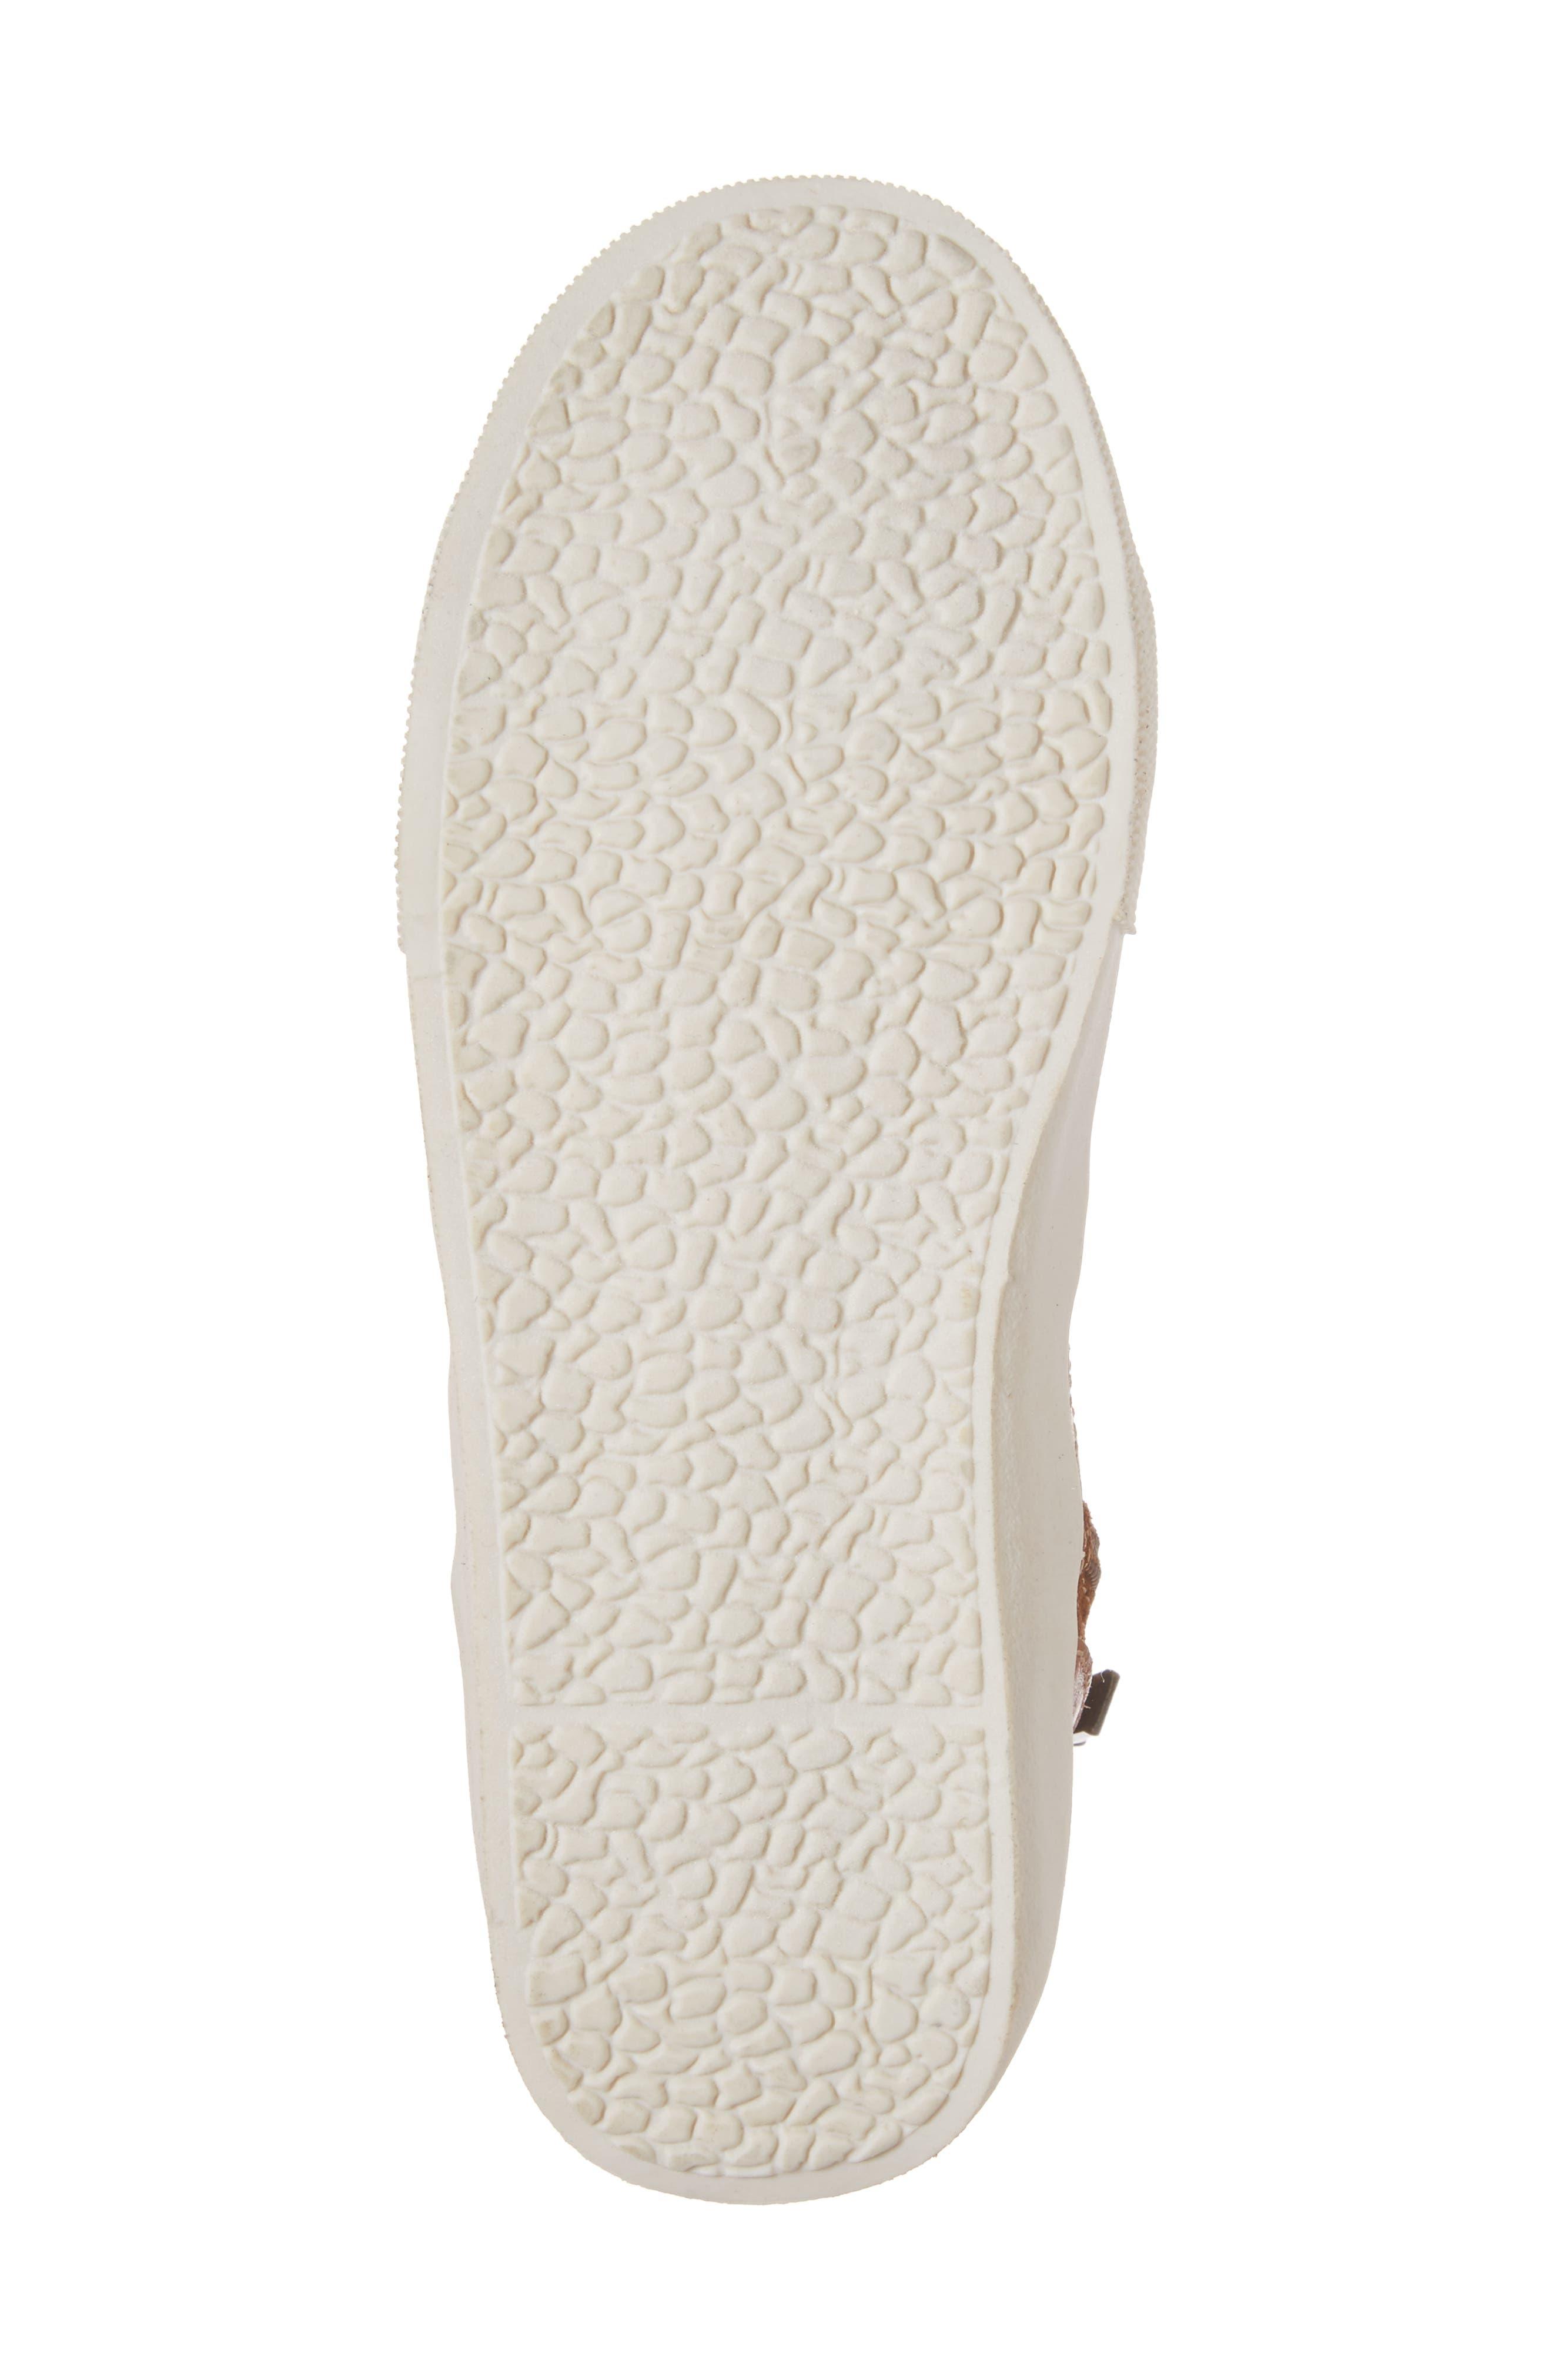 Jay Top High-Top Zip Sneaker,                             Alternate thumbnail 6, color,                             205